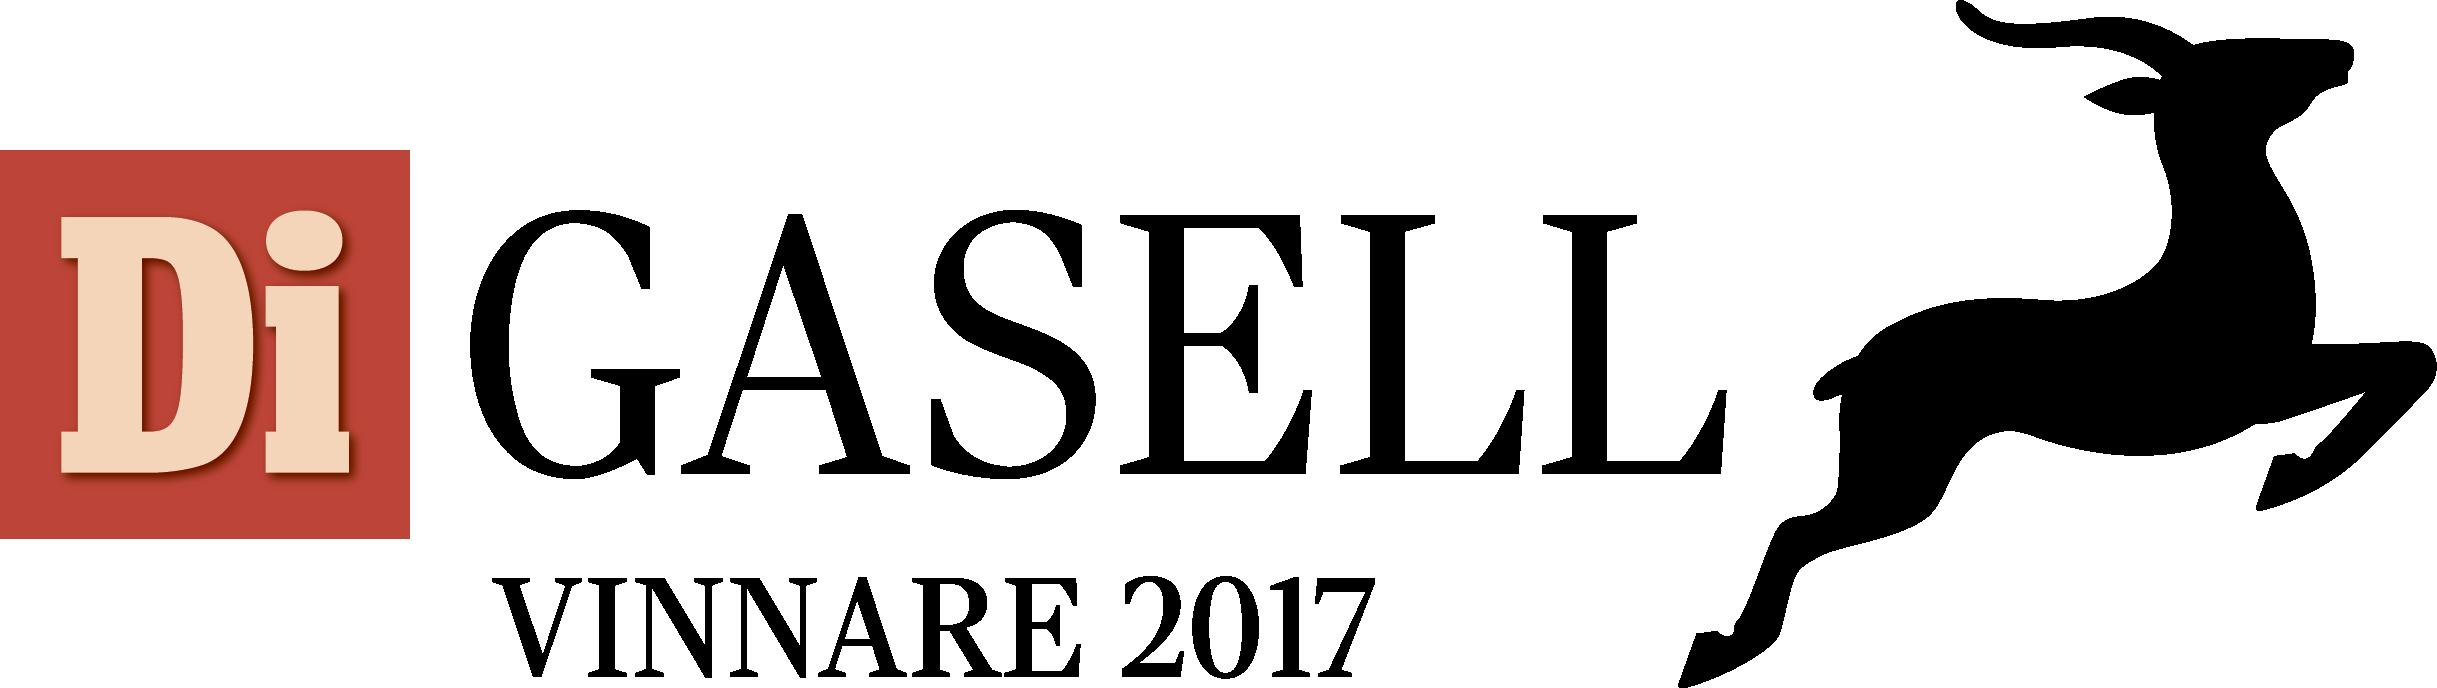 Byxor L7117-1 - Bling - Svart 4fa181106d40c